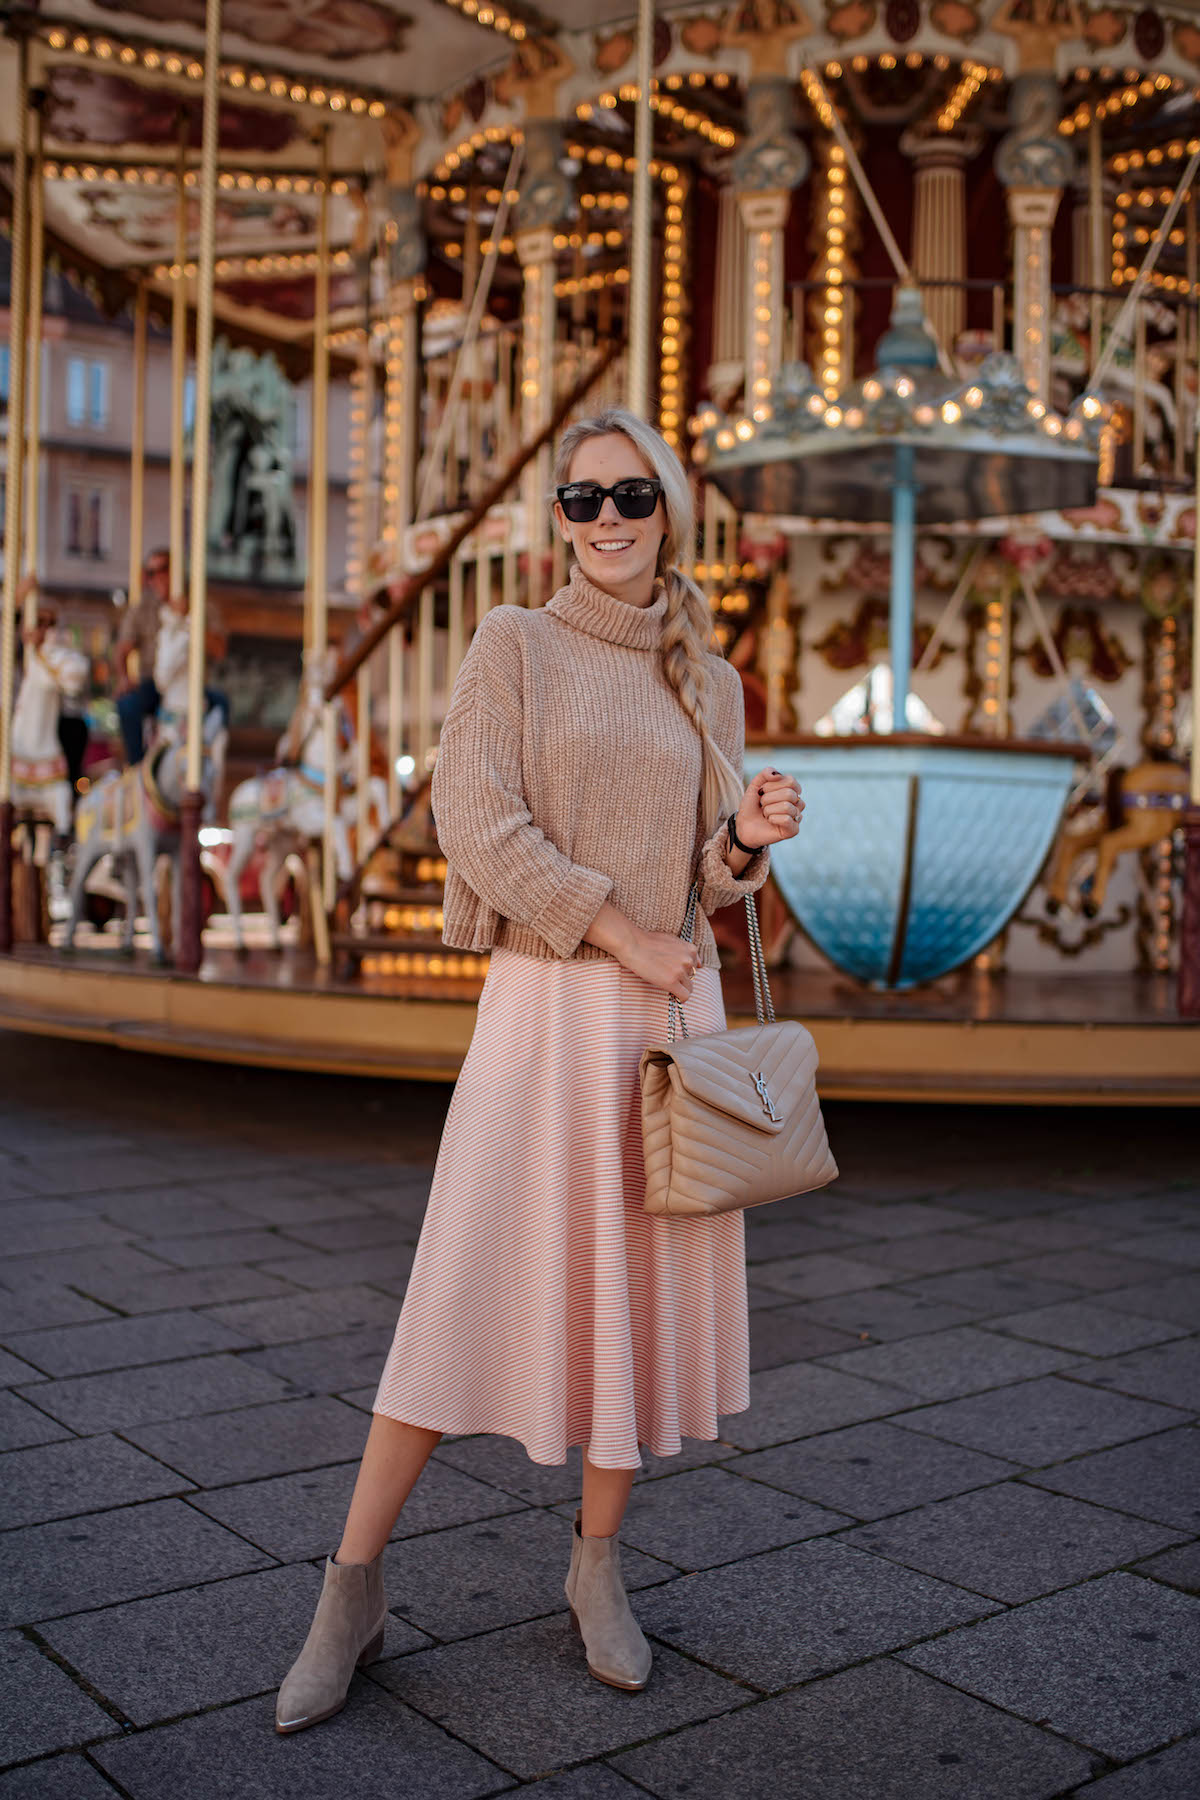 b776a91bf01e0 Knit Midi Dress   Chenille Sweater at the Strasbourg Carousel ...